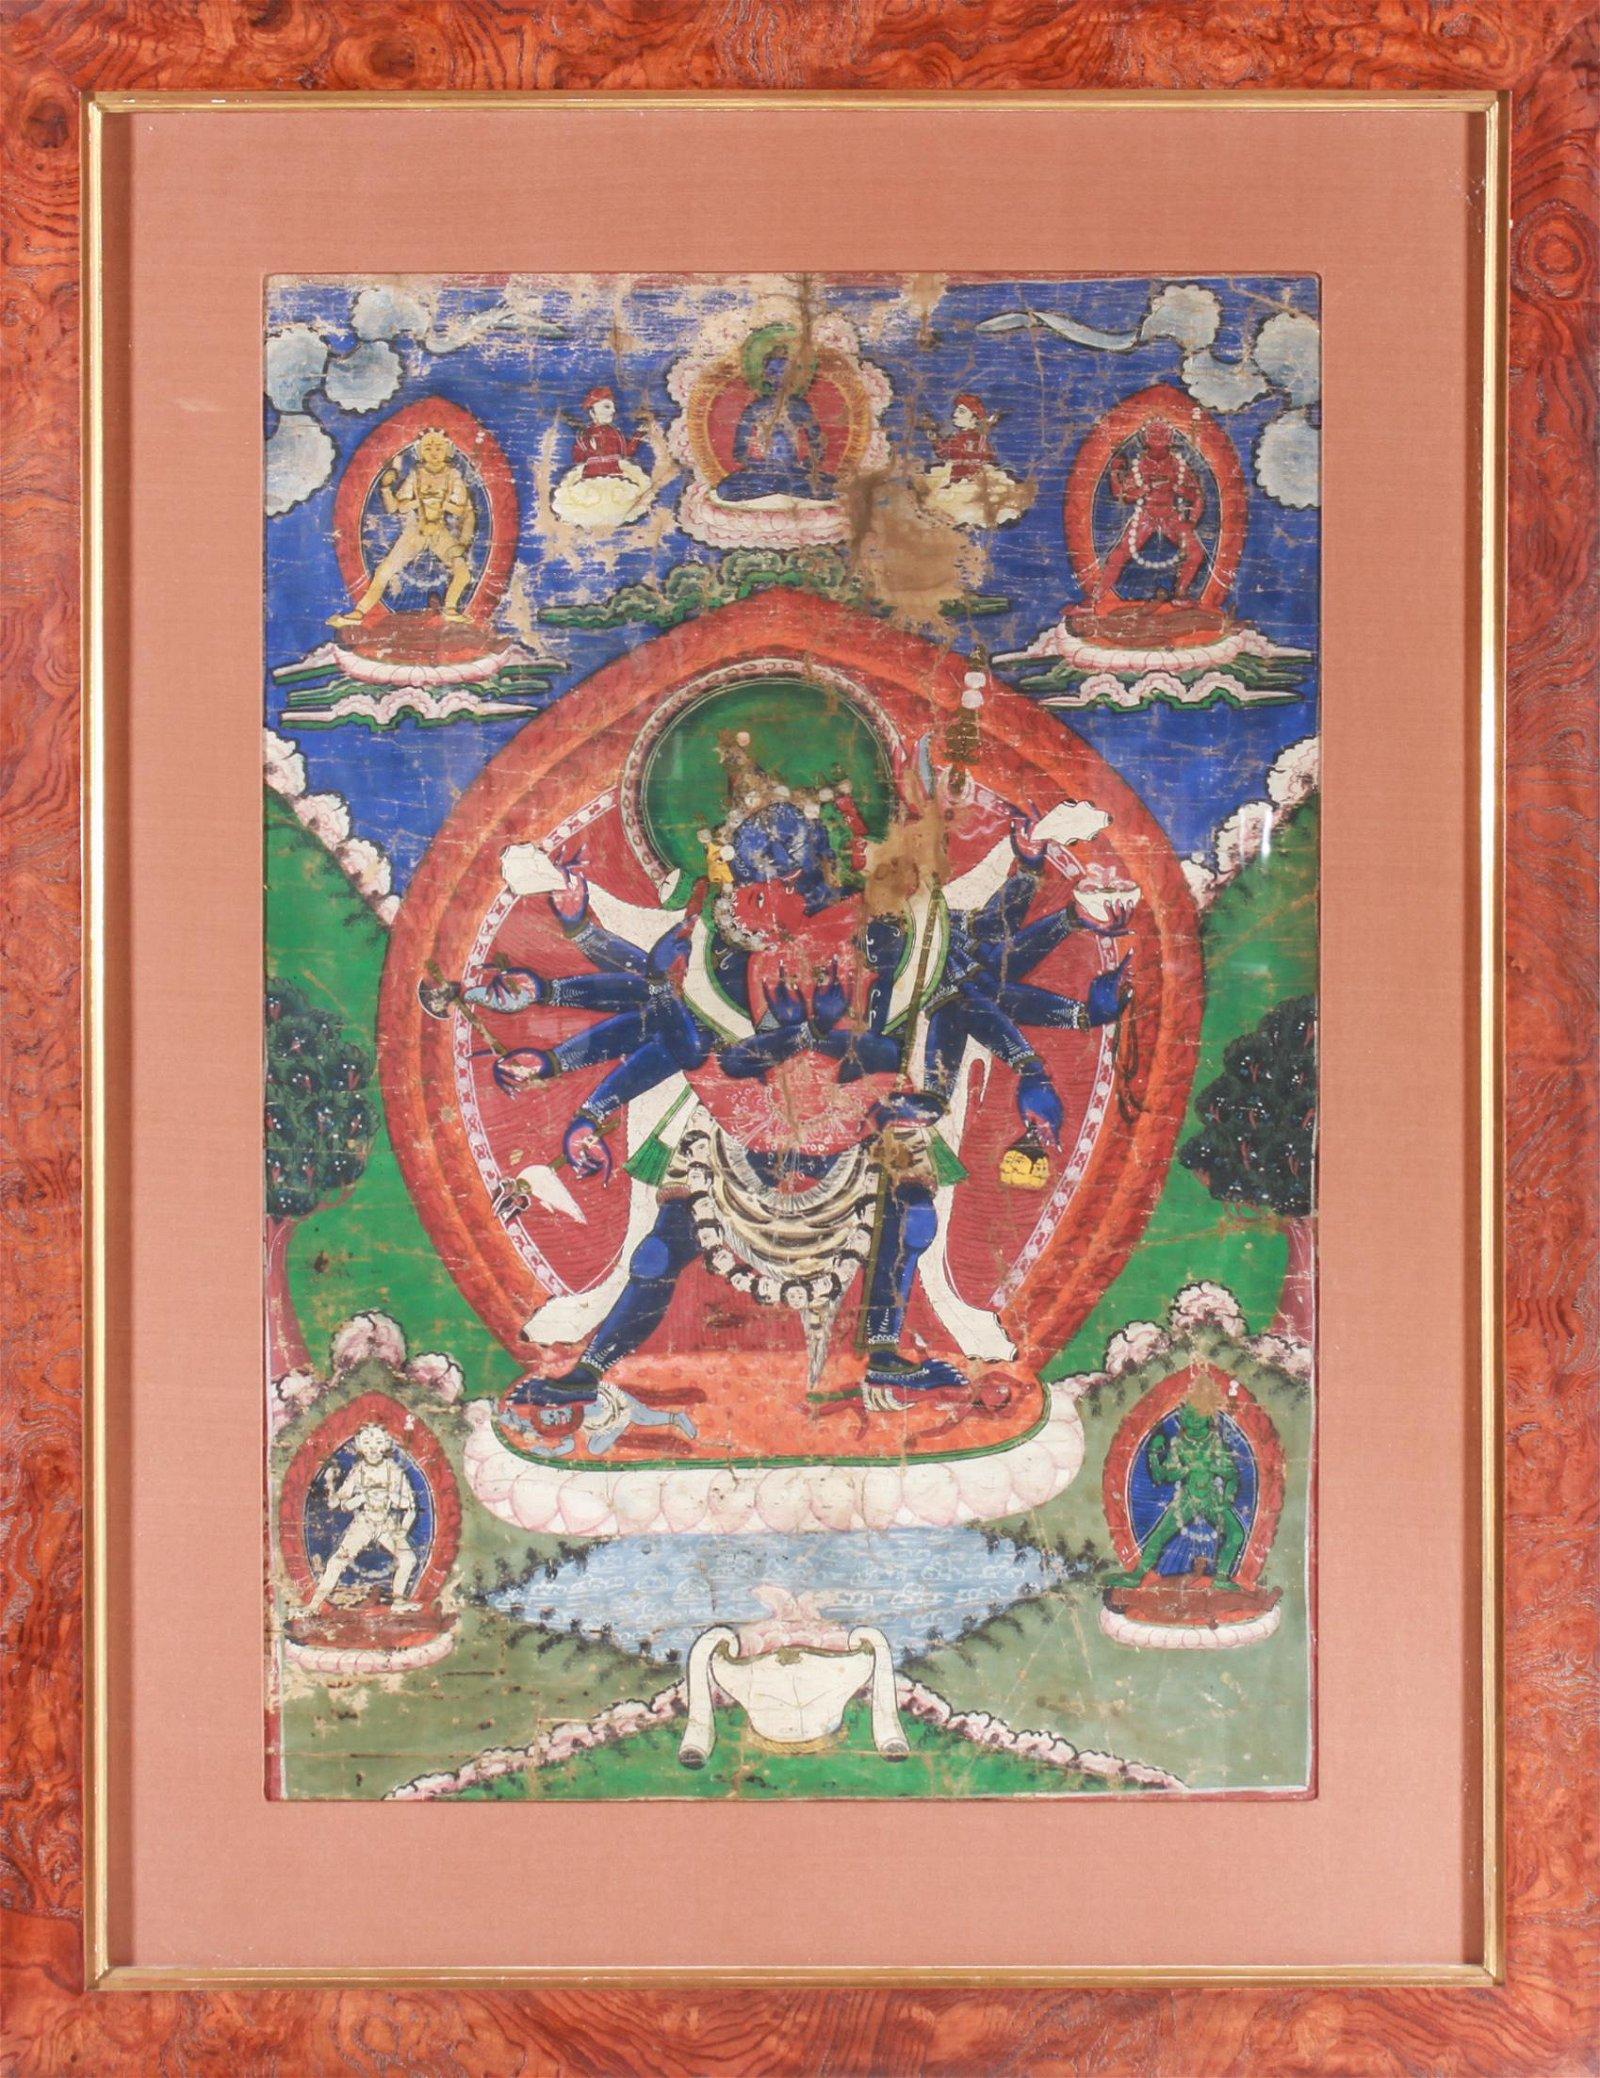 Tibetan Thangka Painting Opaque Pigments on Linen